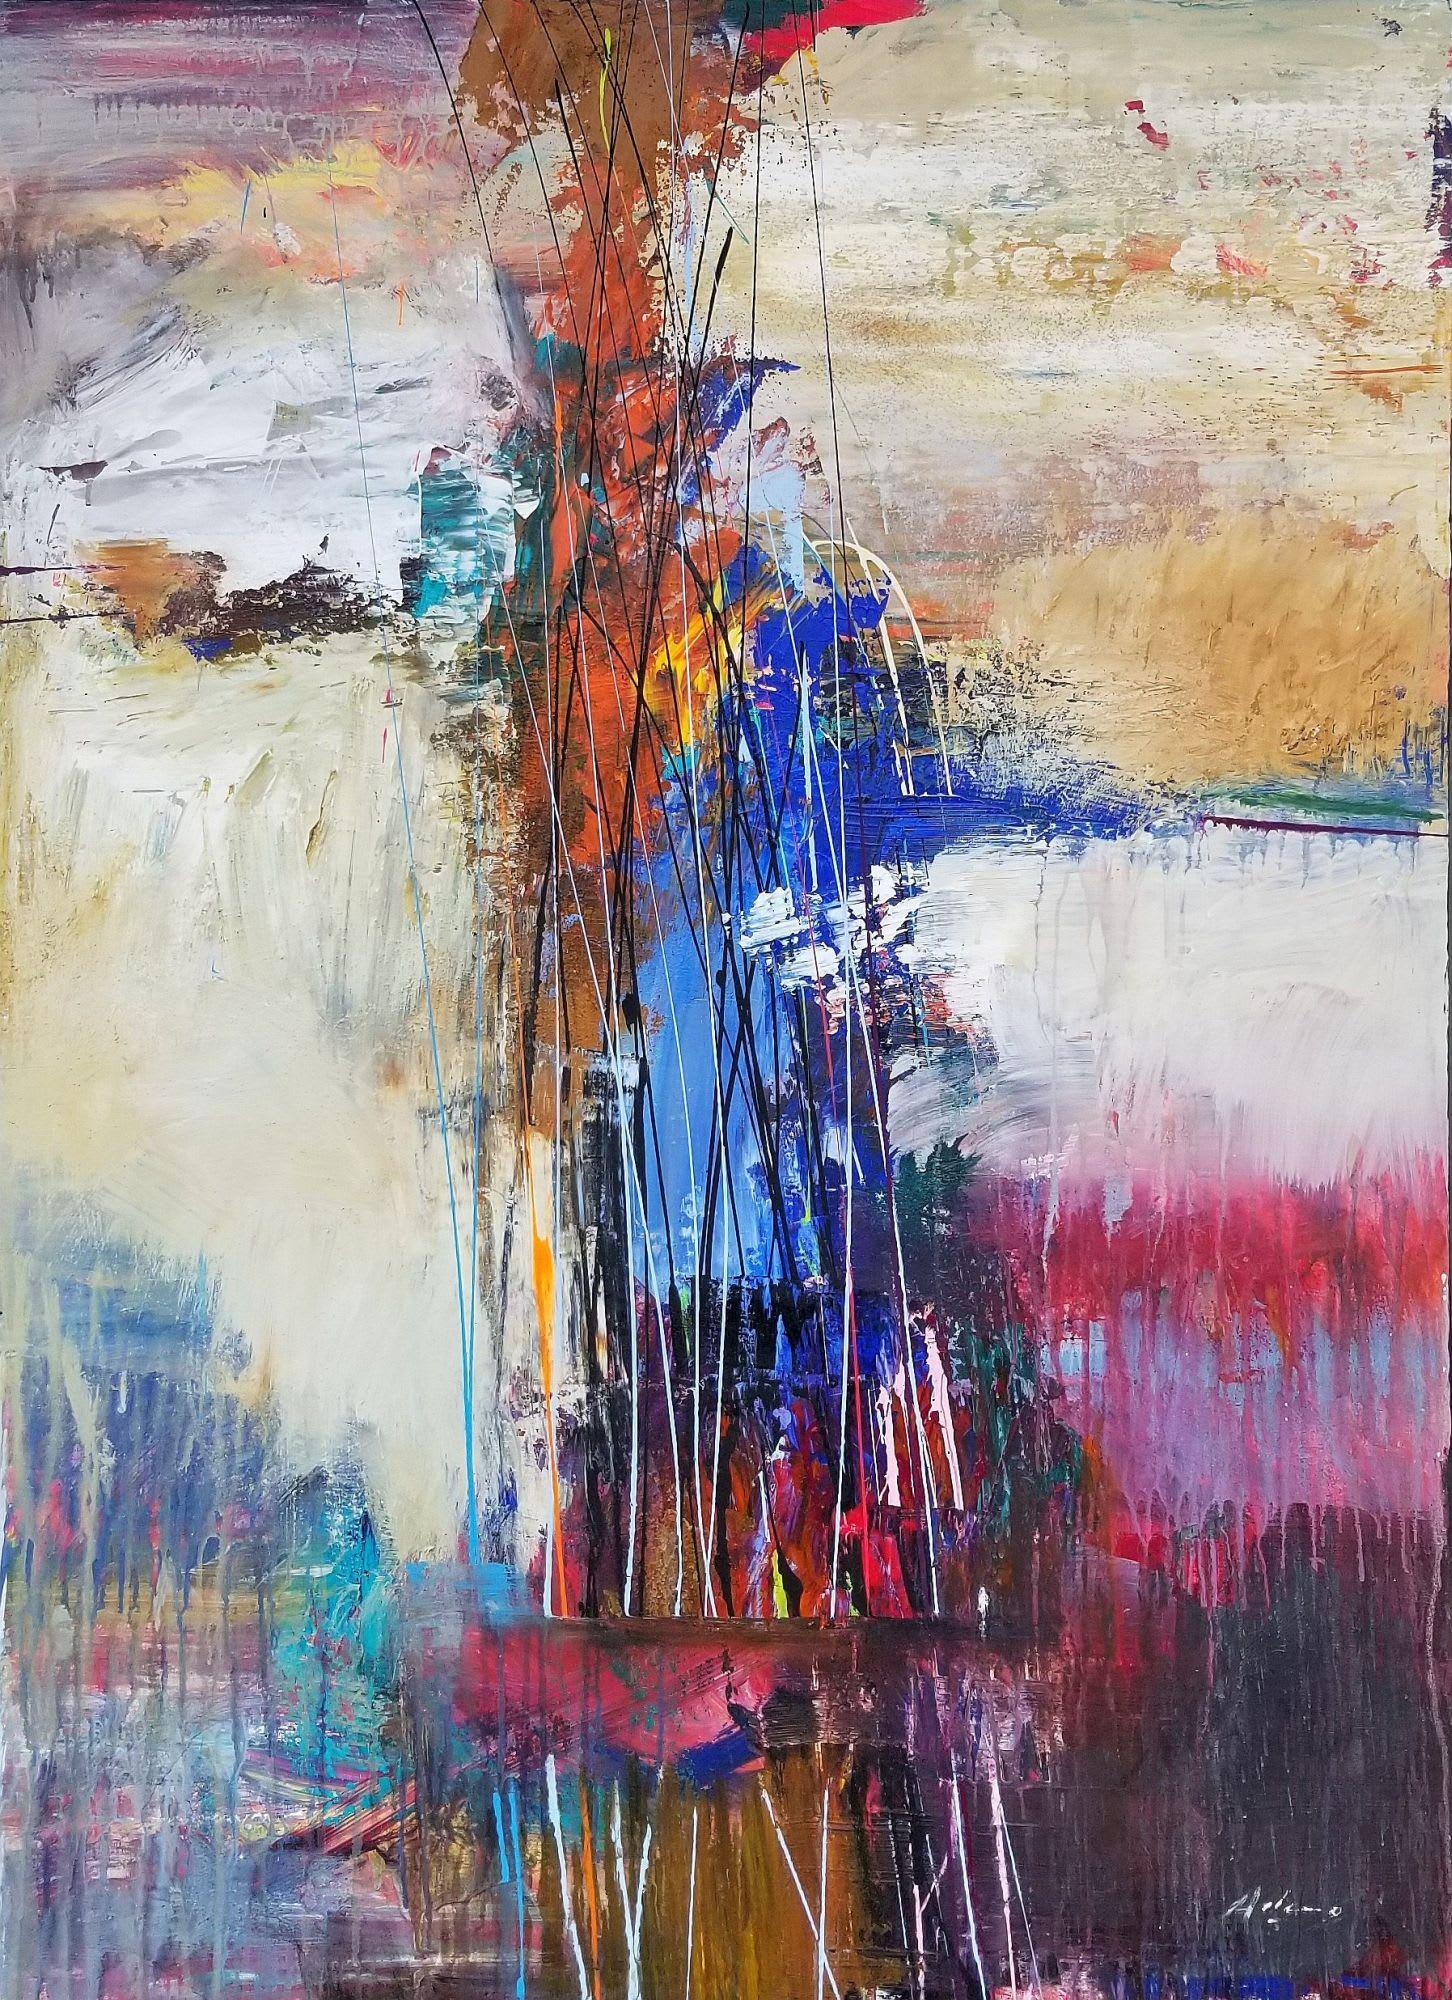 'Napoli' by Pietro Adamoat Gallery 133